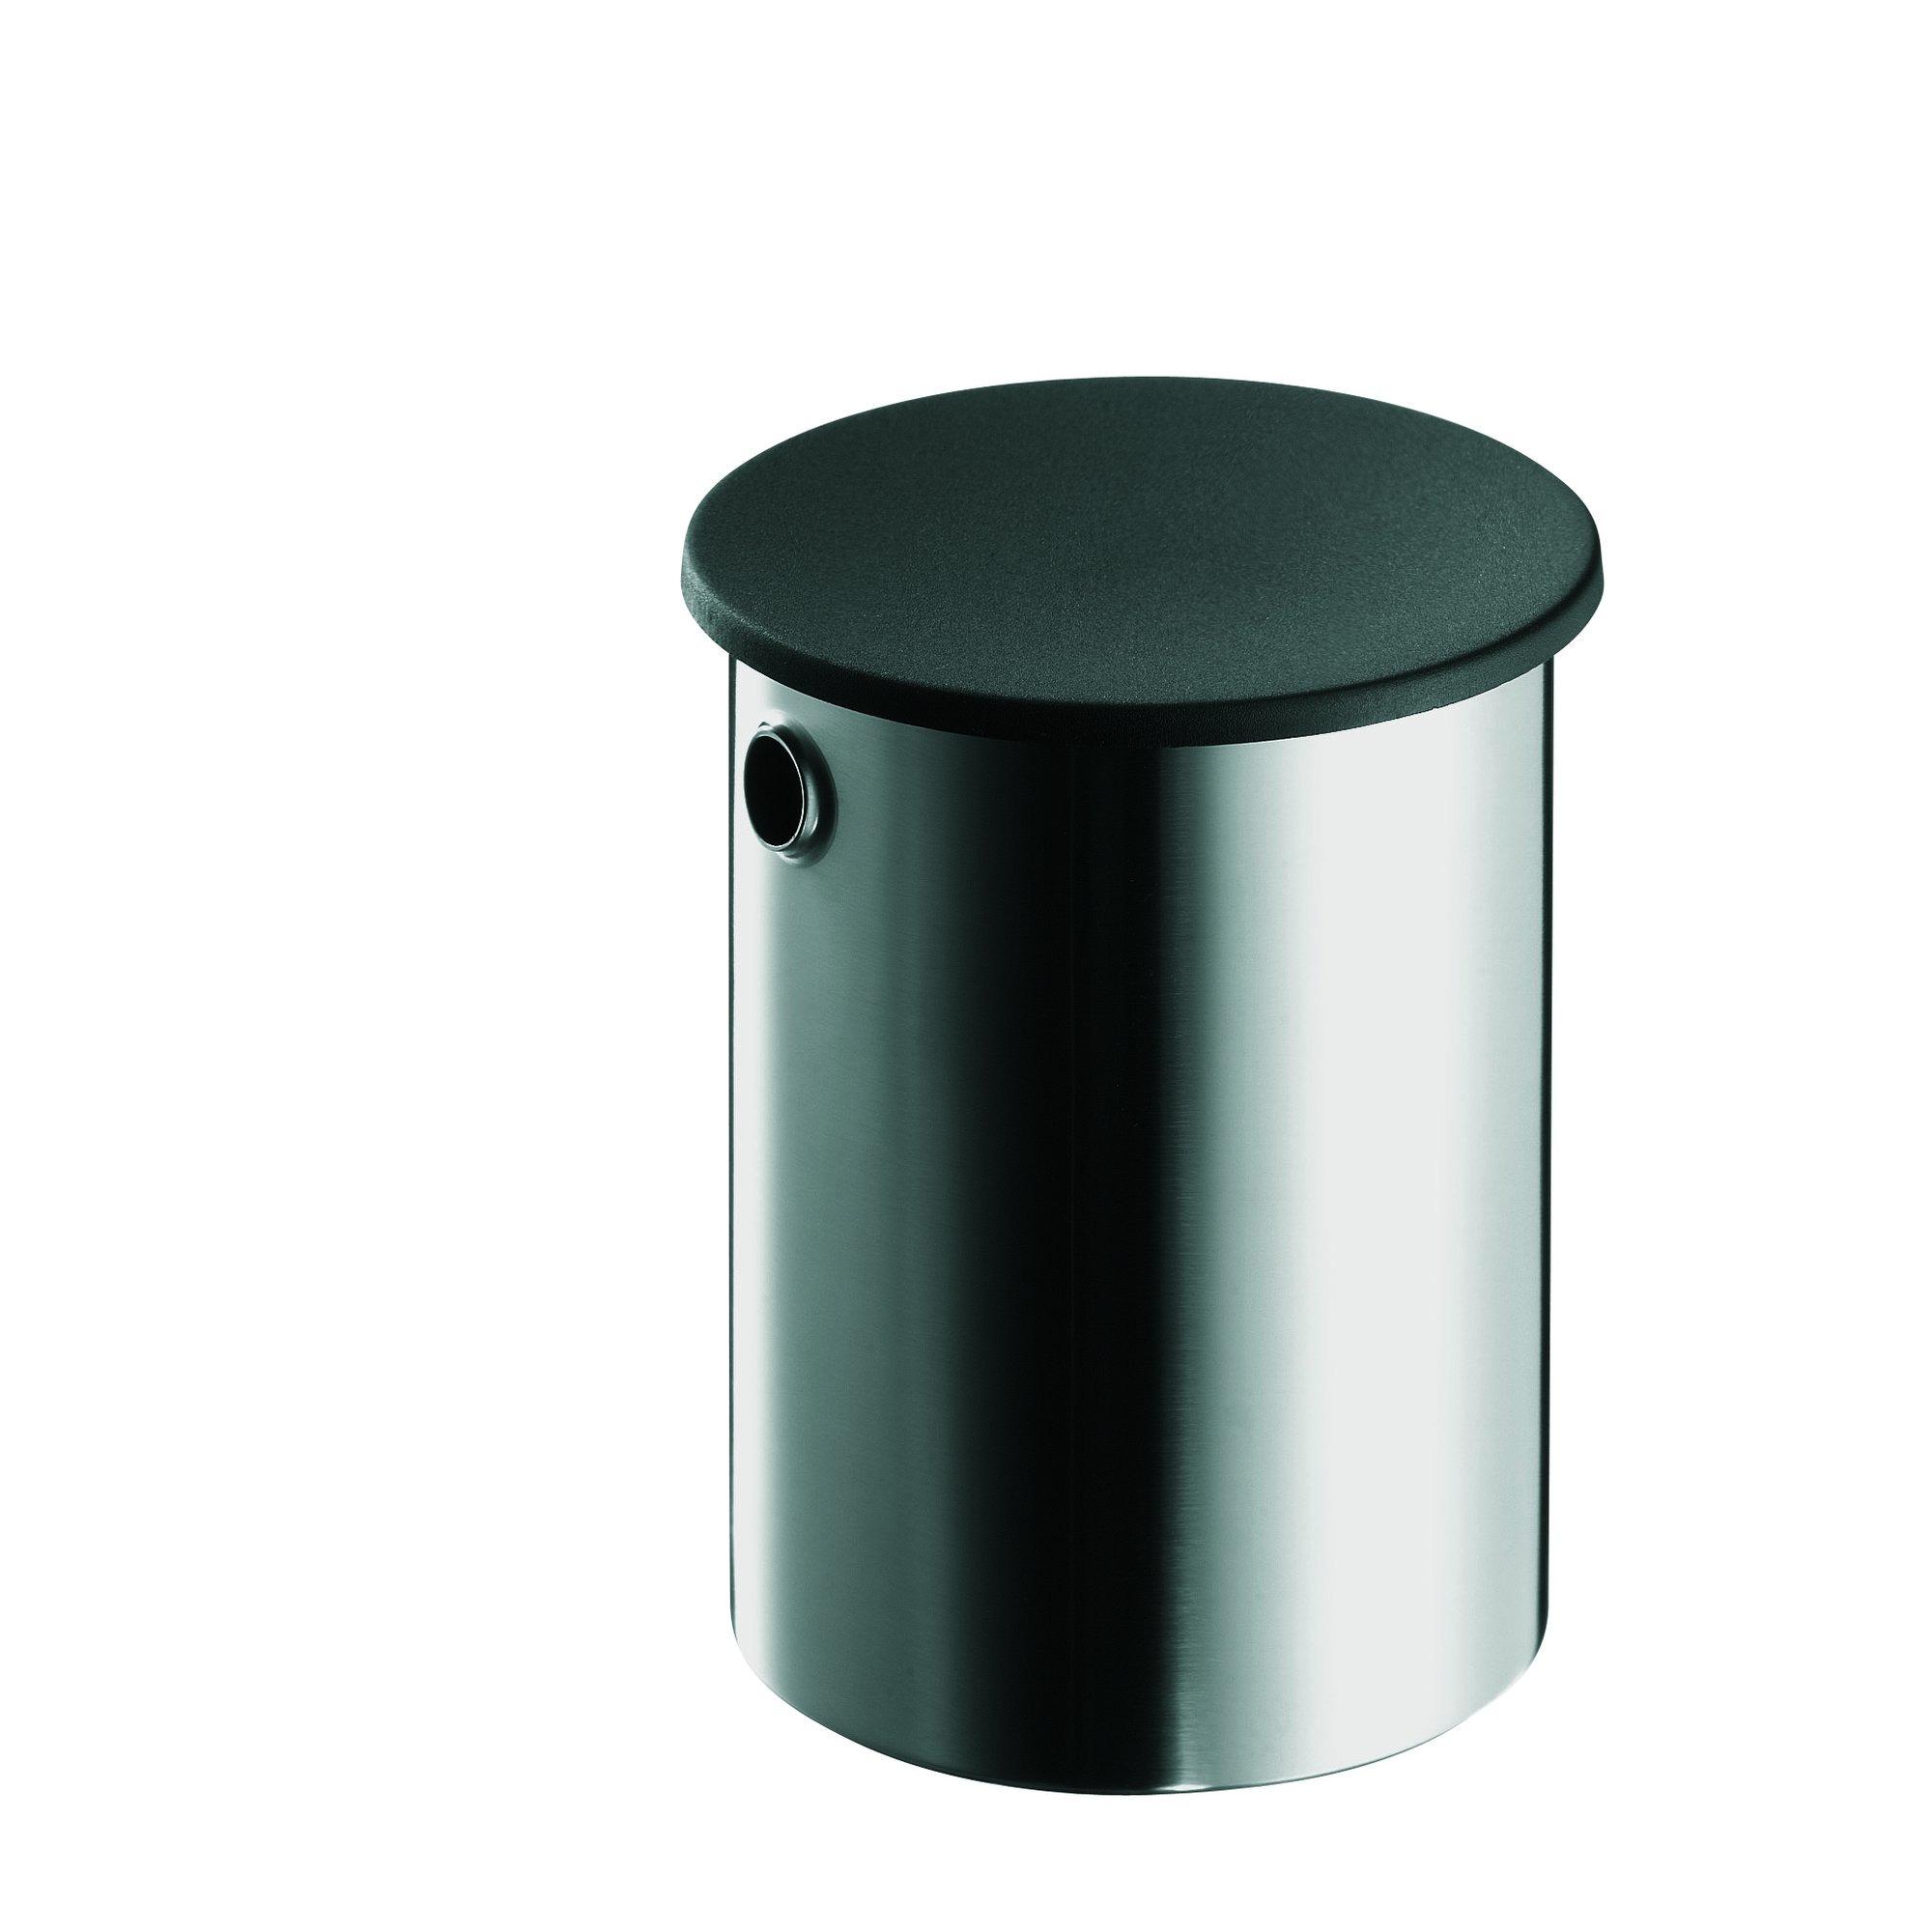 Stelton EM gräddkanna 025 liter – rostfri